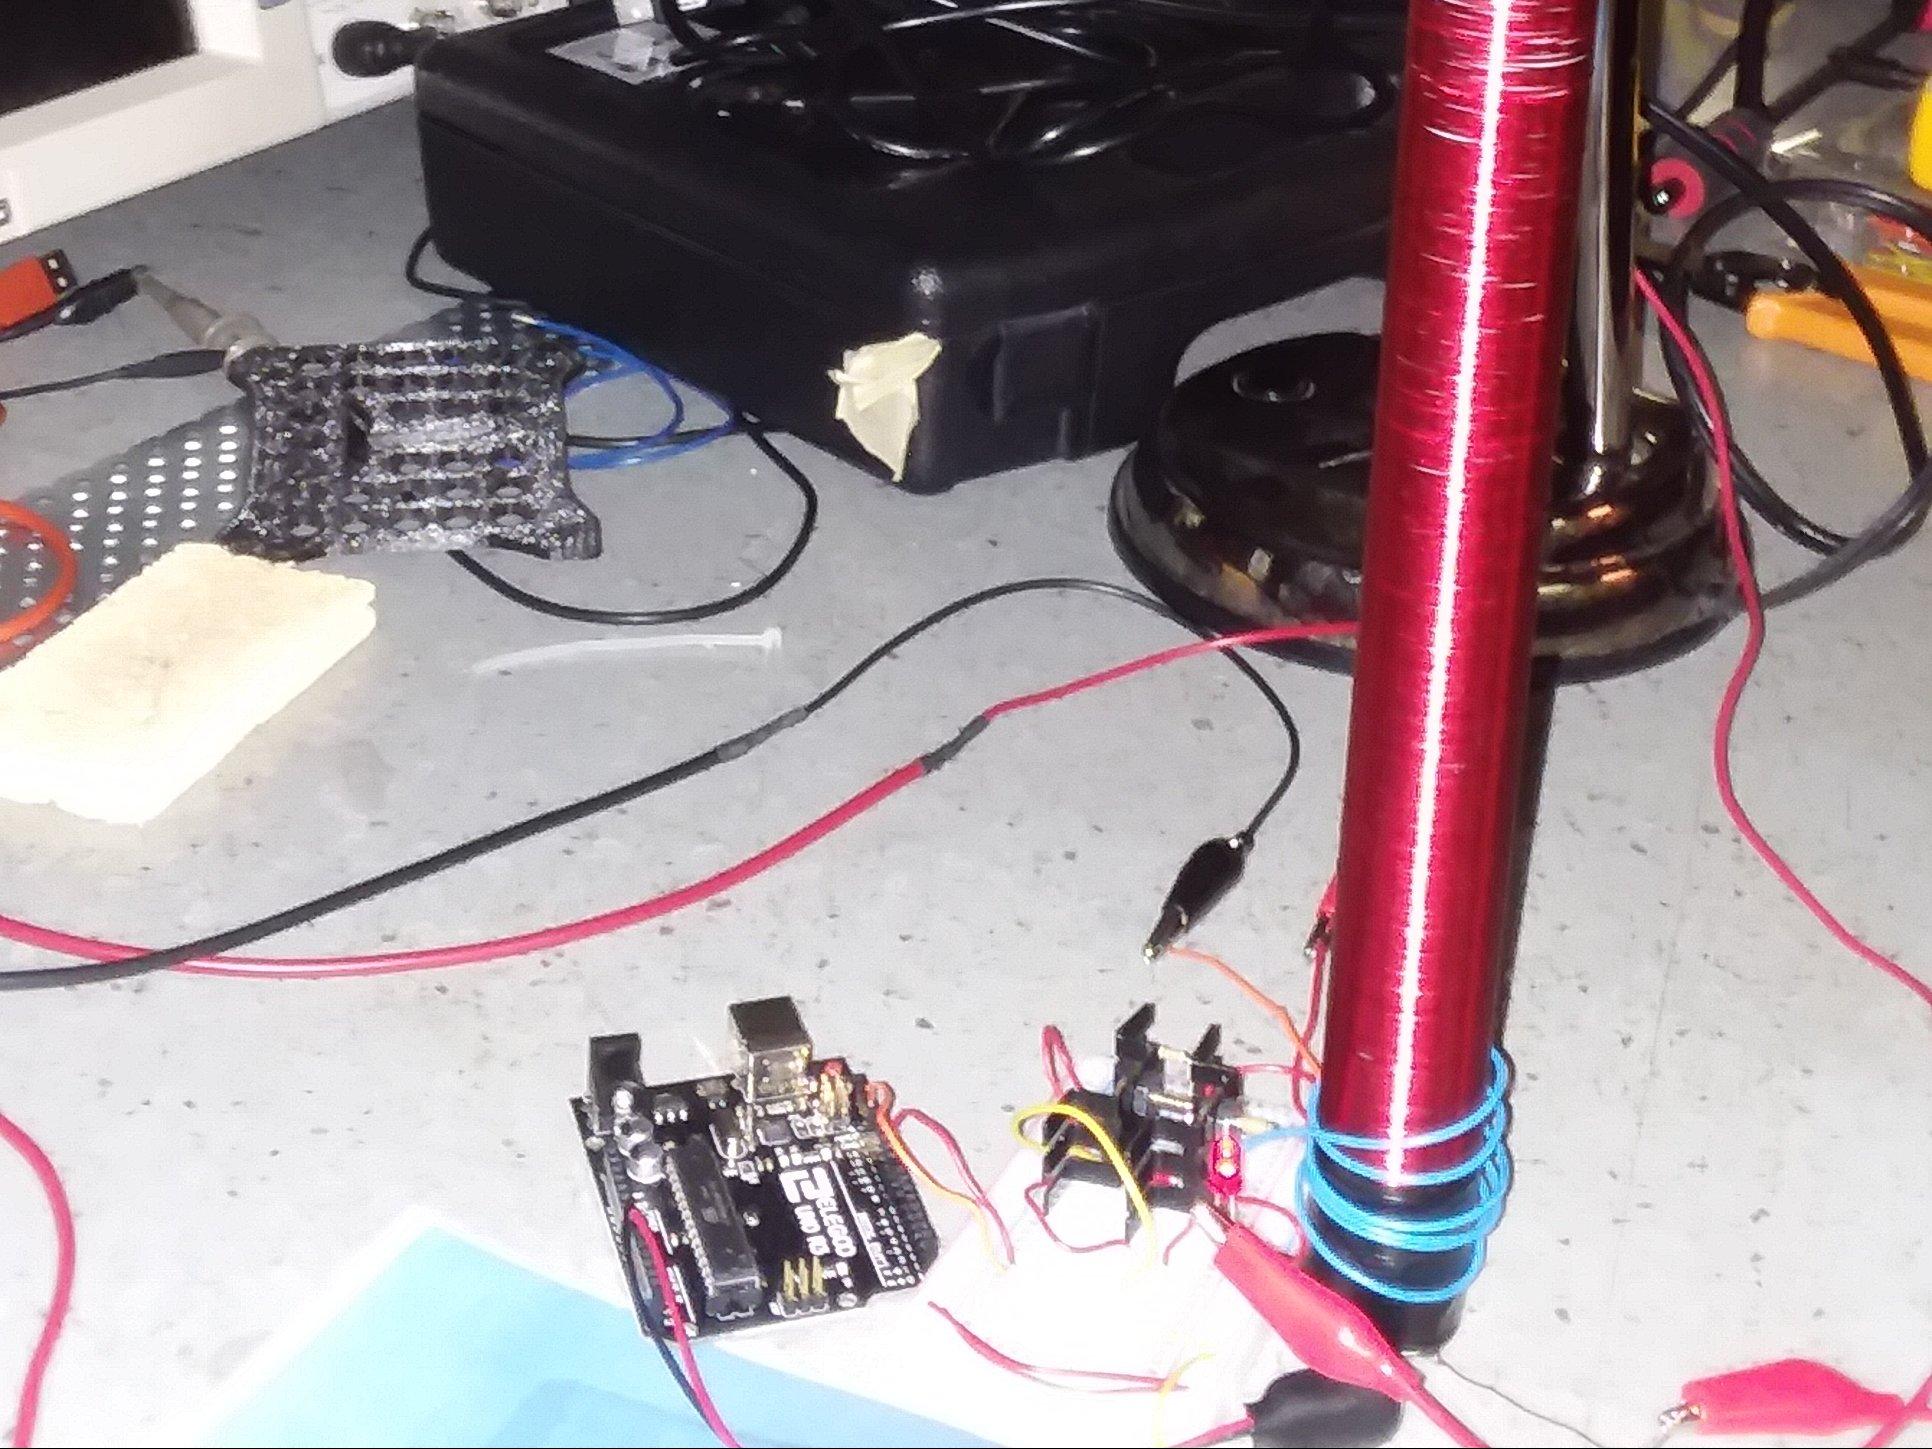 hight resolution of tesla coil wiring dff2n60 trusted wiring diagram tesla motor schematic tesla coil wiring wiring diagram schematics